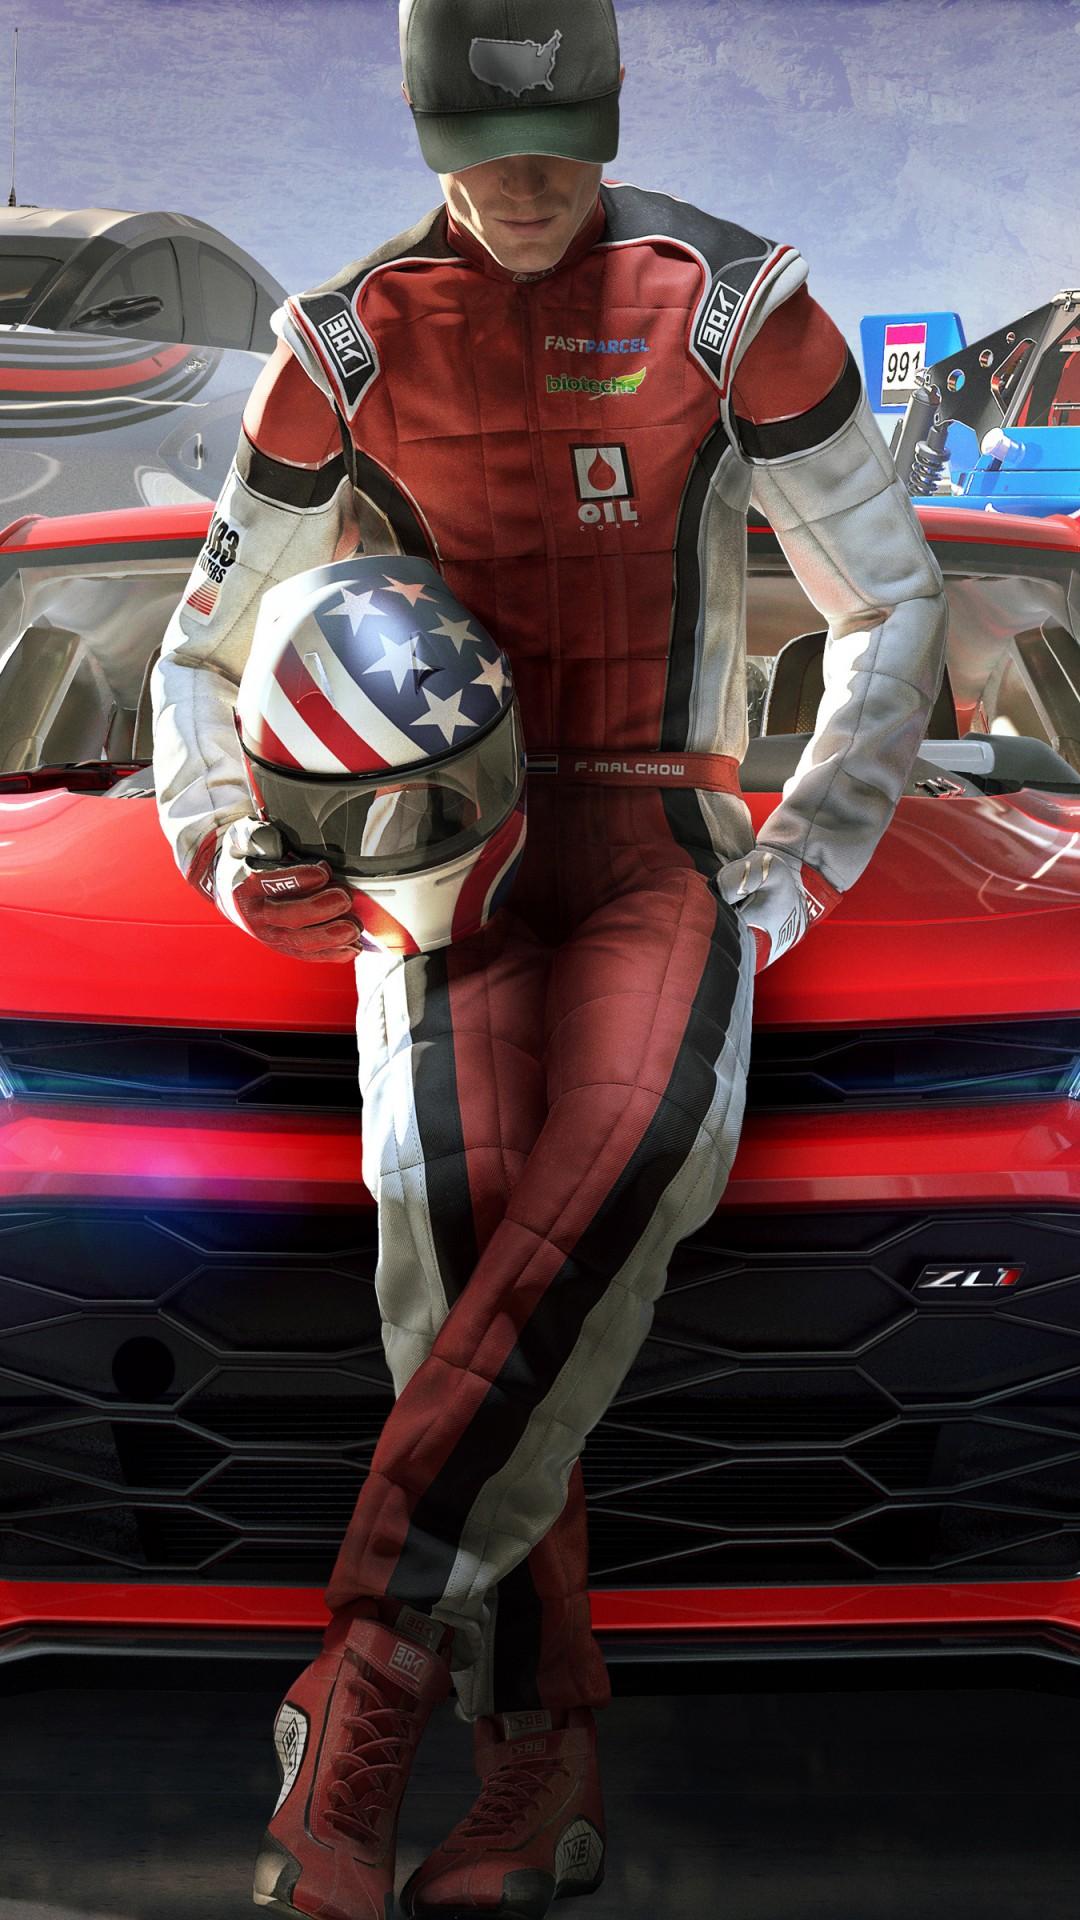 Wallpaper The Crew 2 E3 2017 4k Games 15638